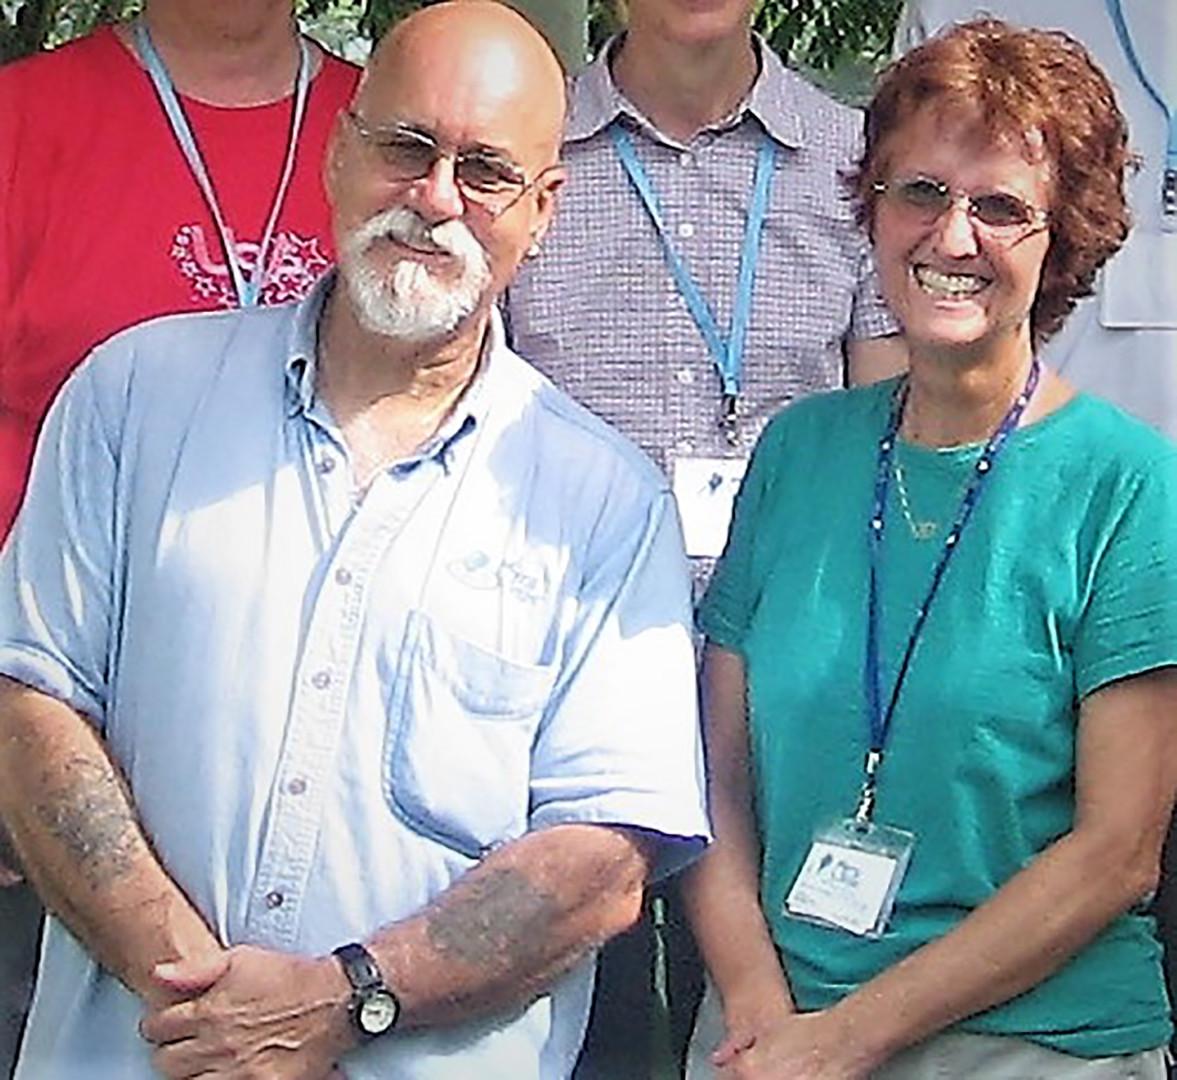 Gary and Silvia Thacker